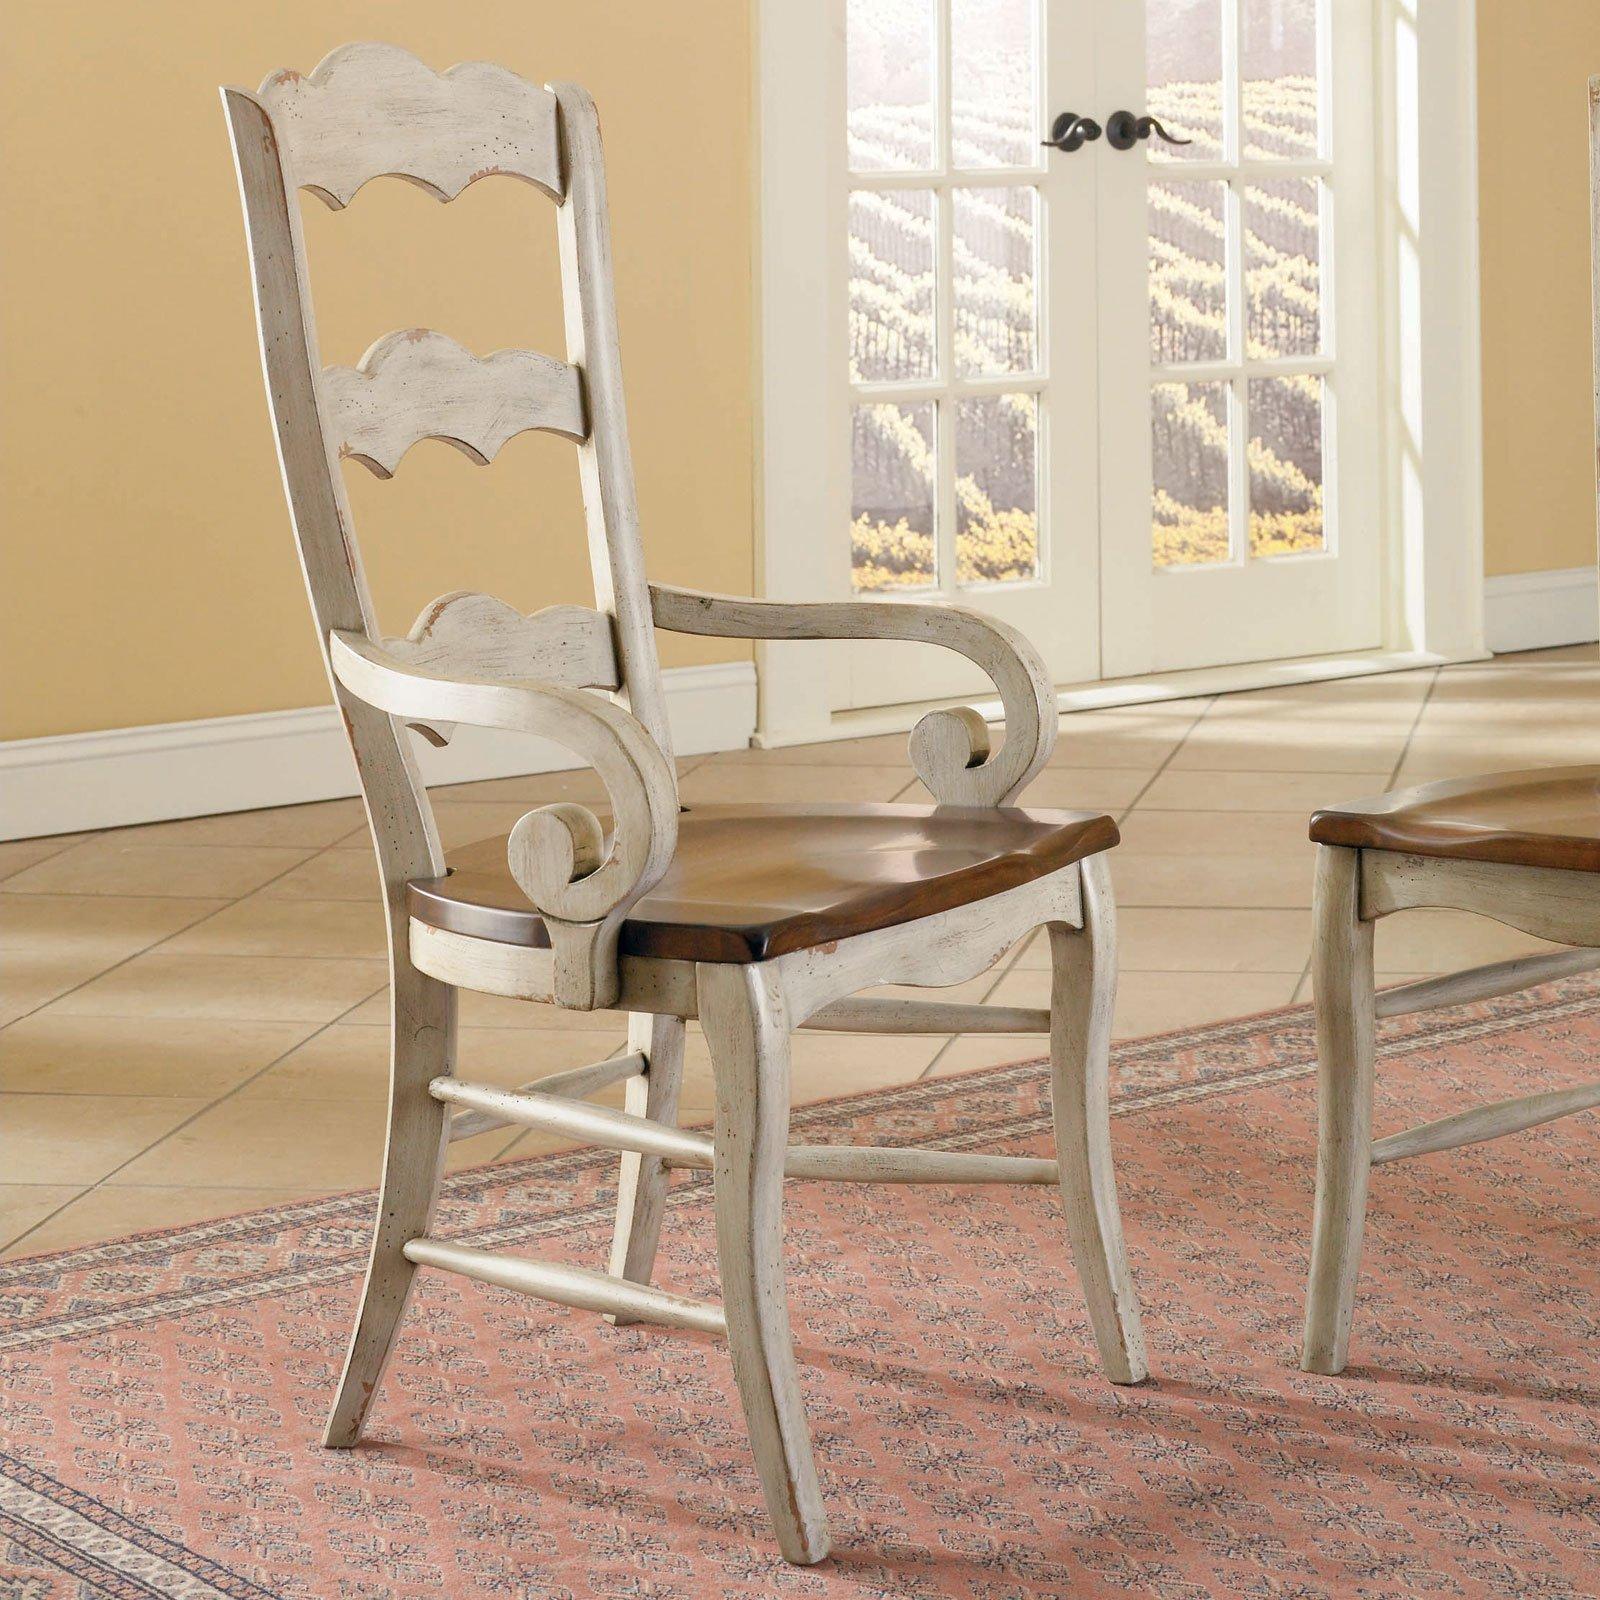 Antique white kitchen chairs Photo - 6